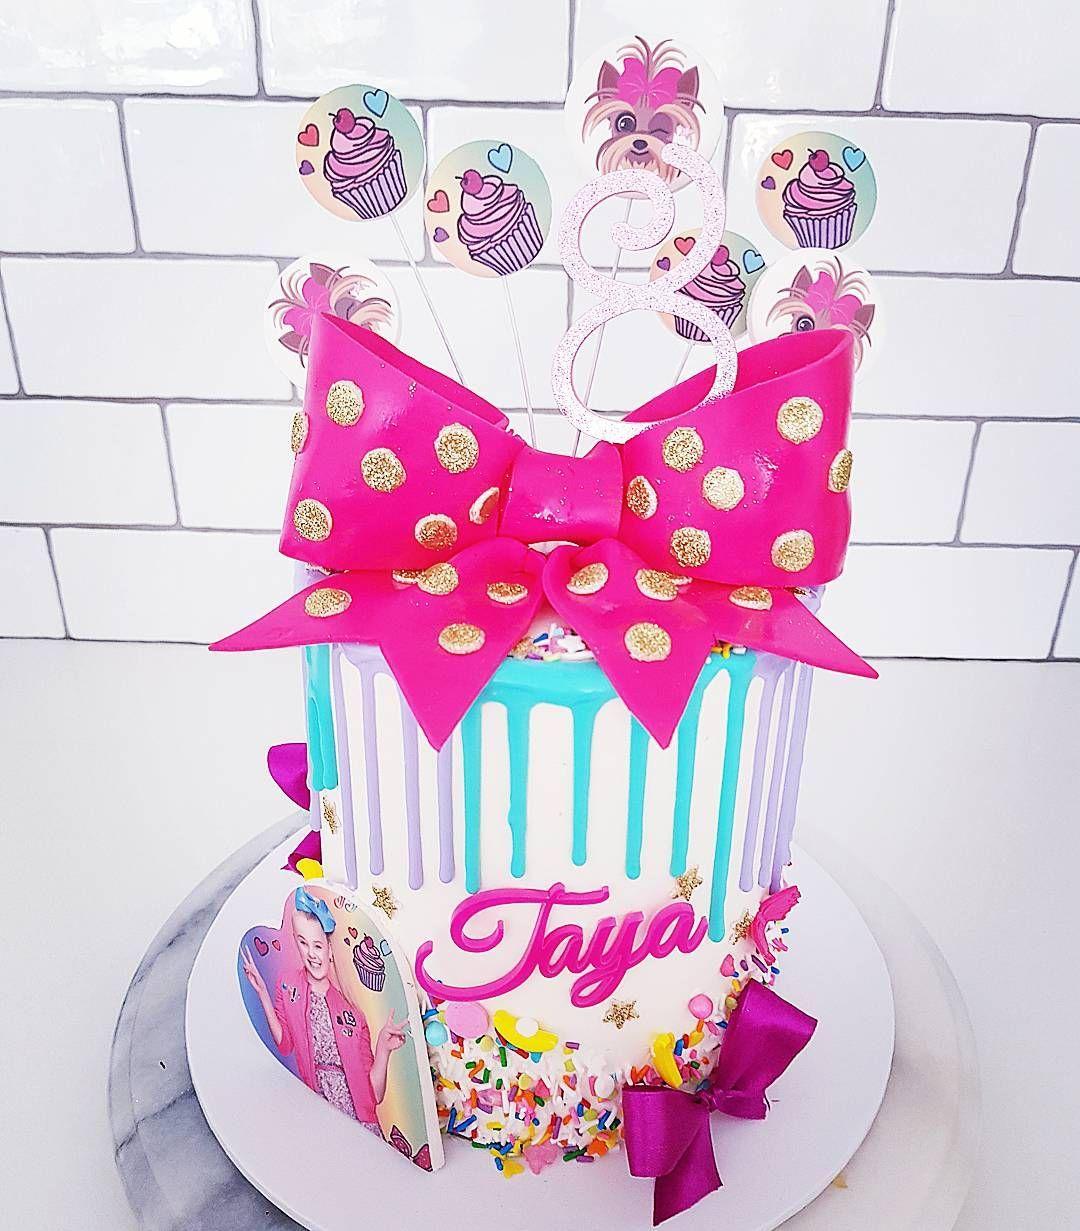 Jojosiwa Birthday Cake Dripcake Rainbowcake Colourful